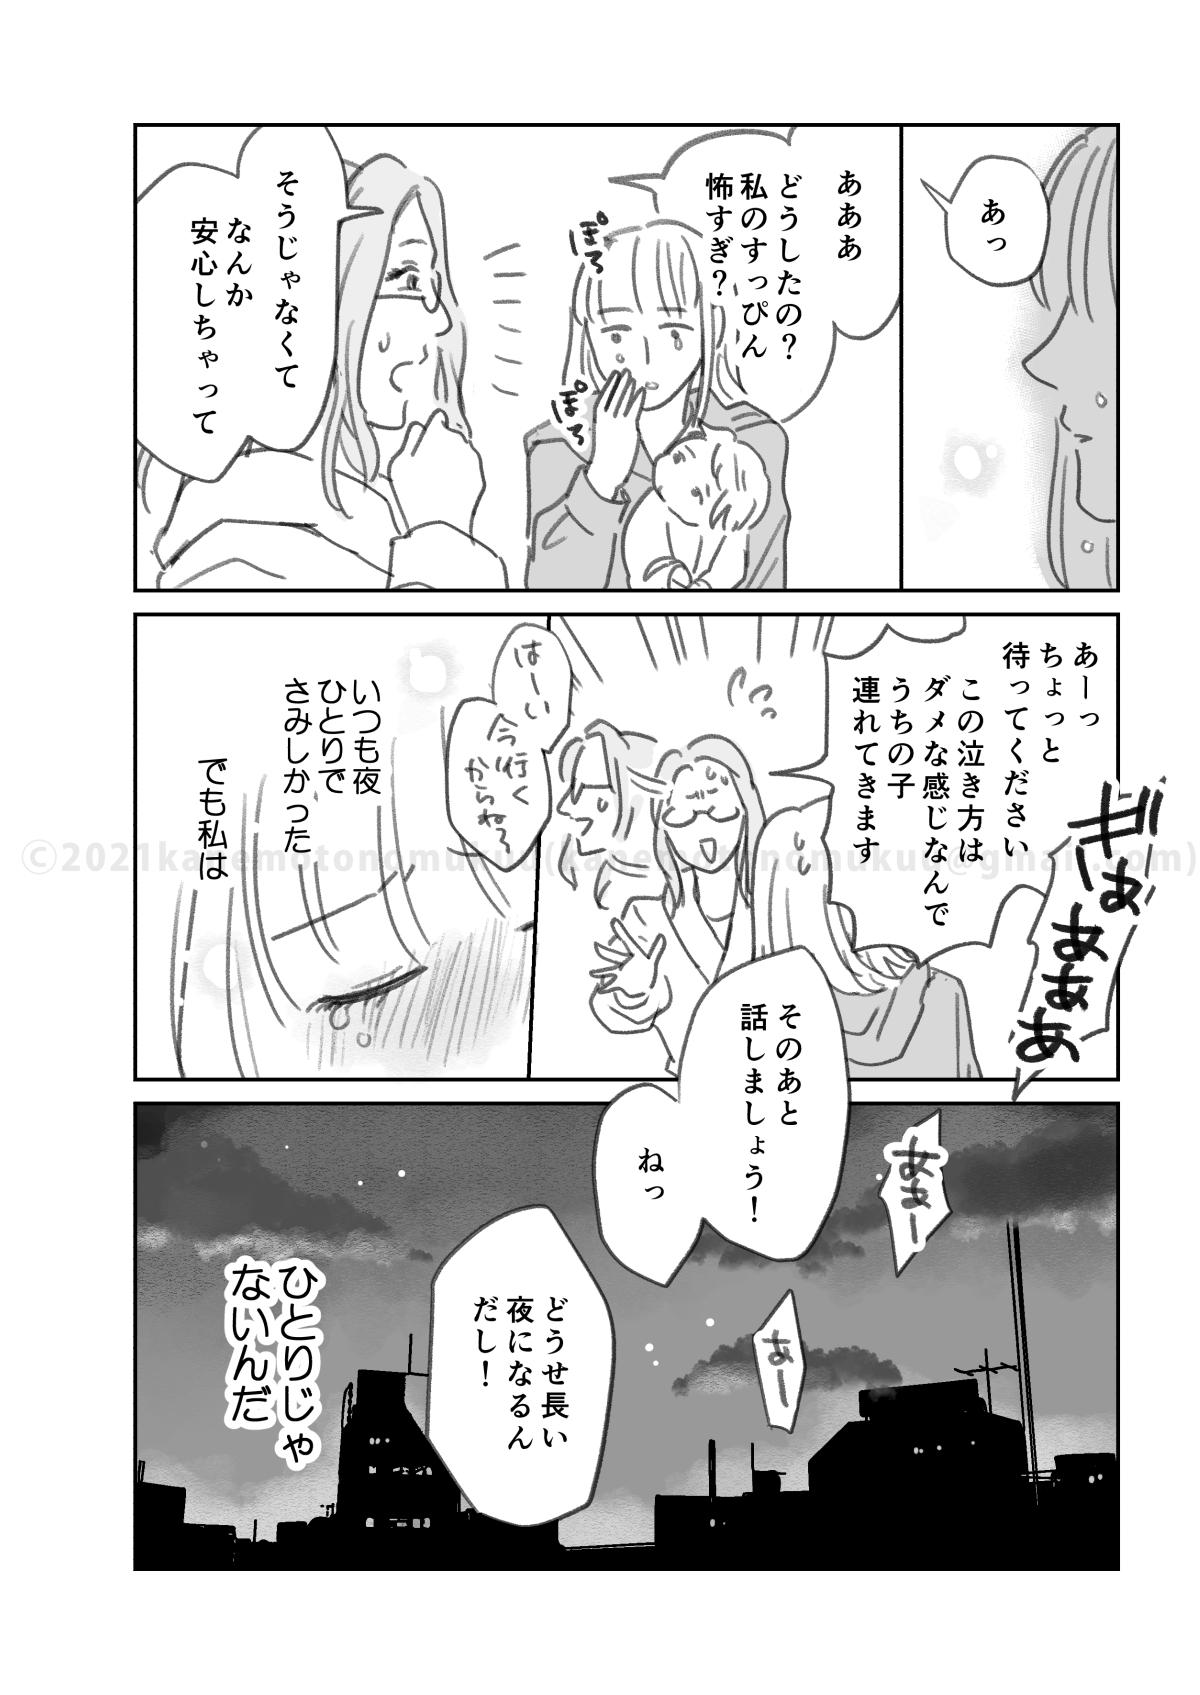 f:id:kanemotonomukuu:20210321145640j:plain